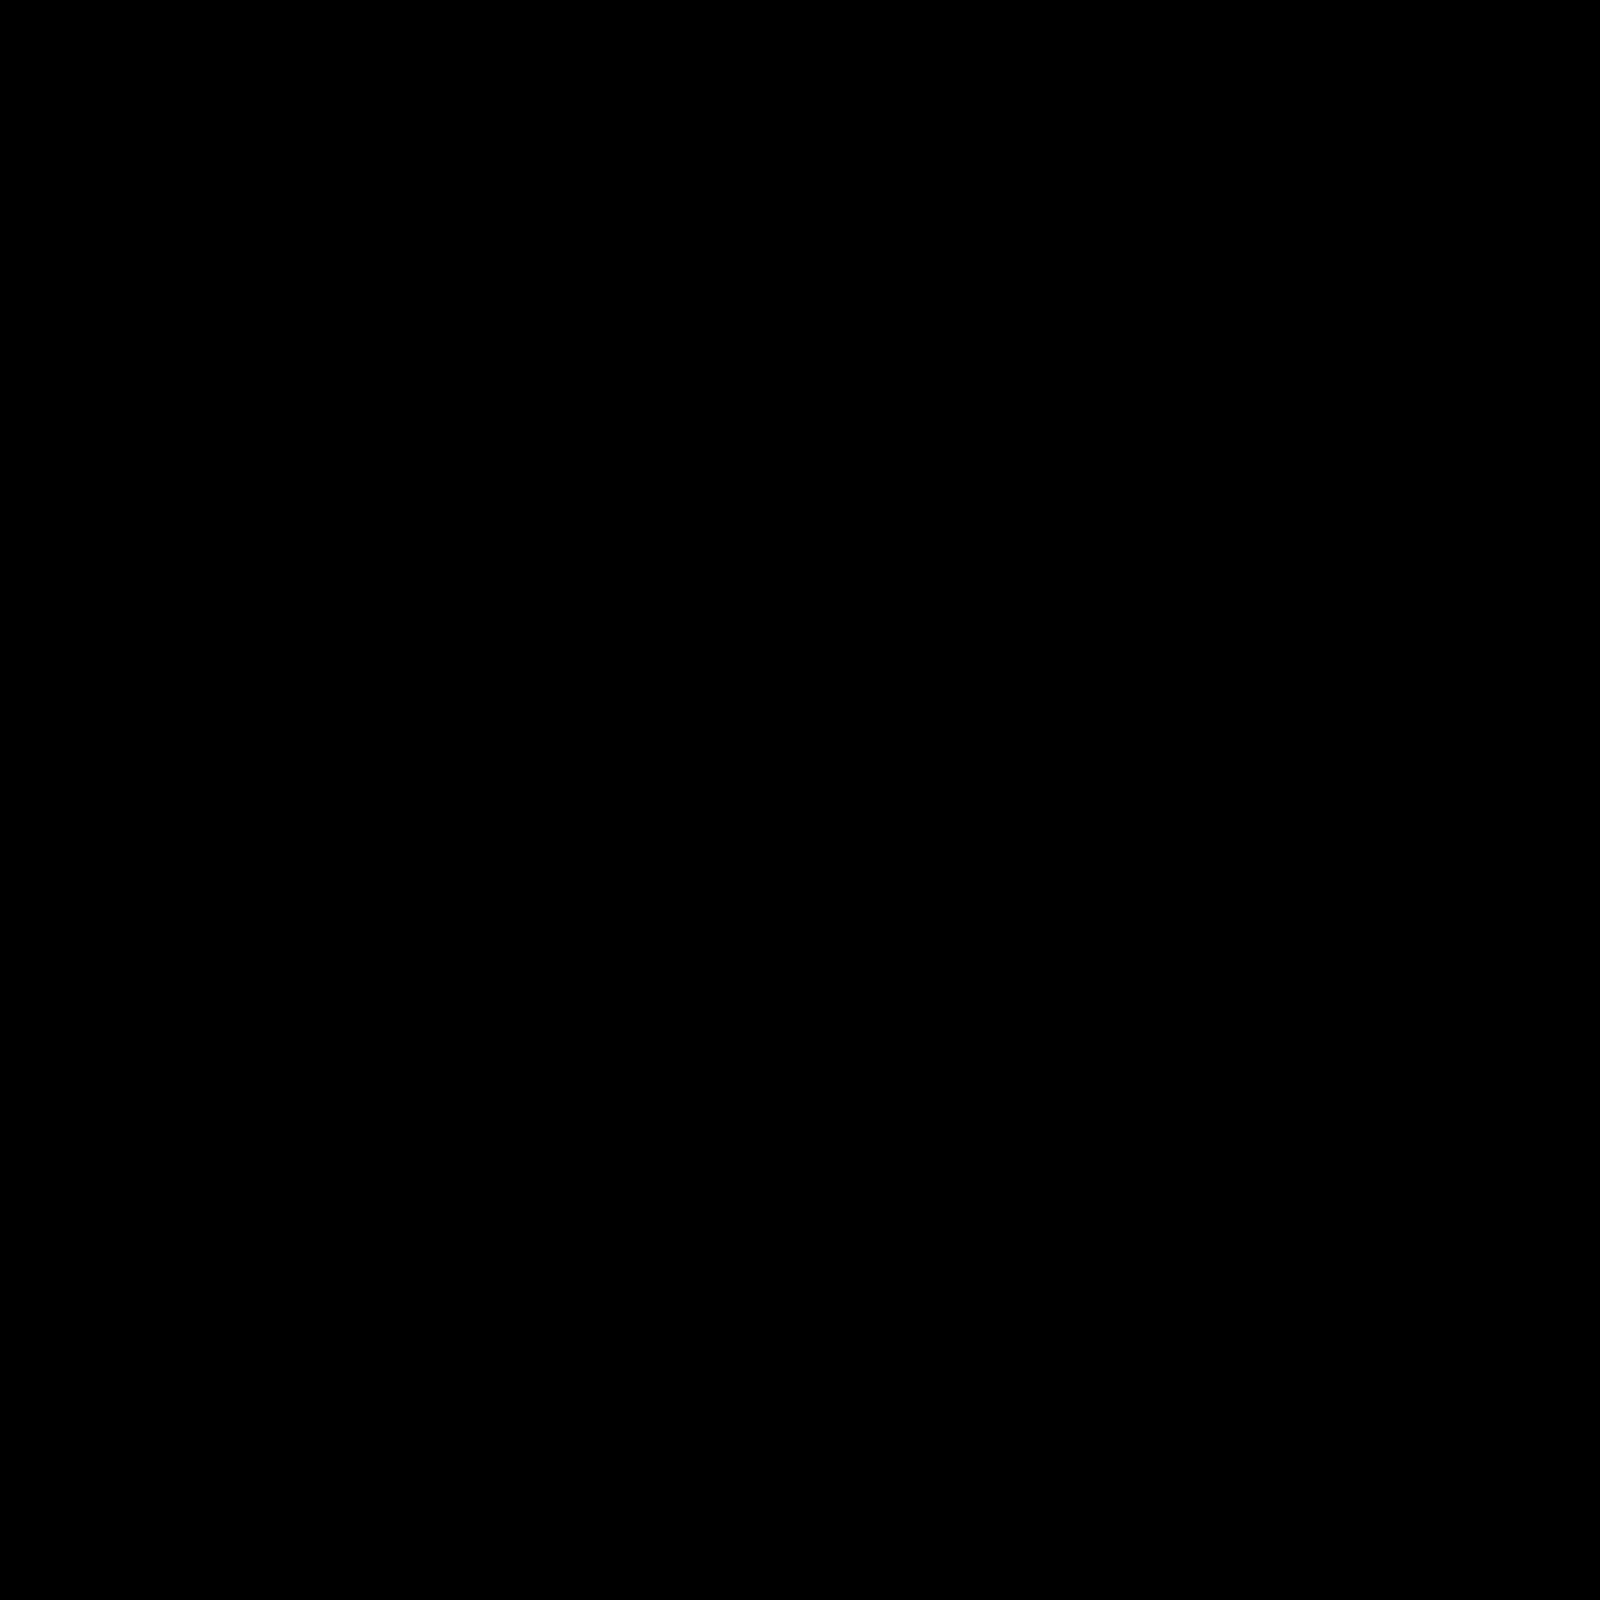 Upward Arrow icon